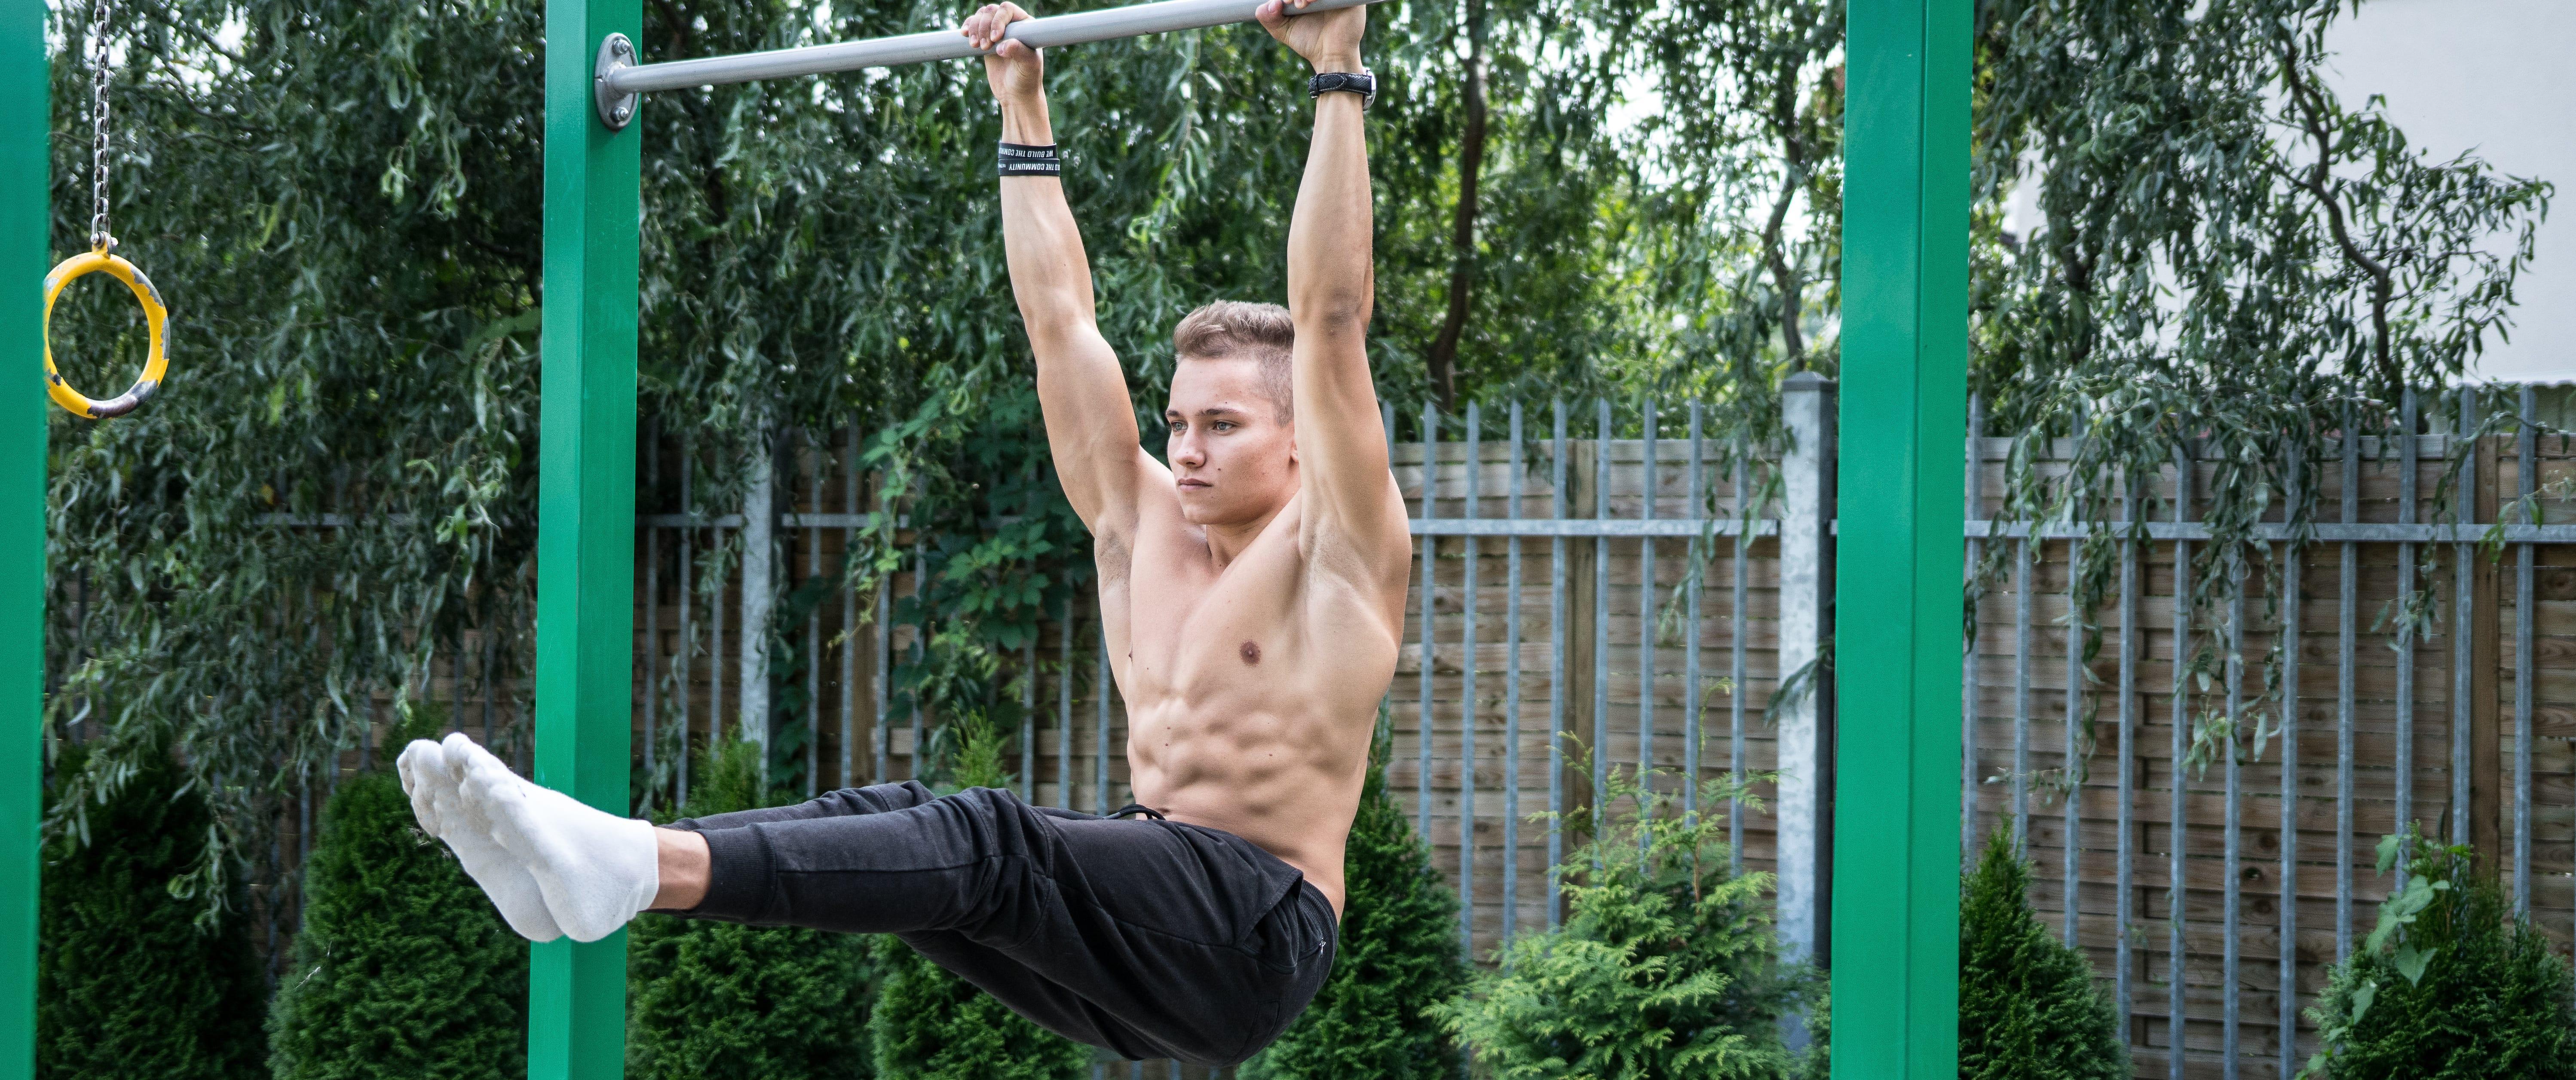 leg raises l sit calisthenics exercise